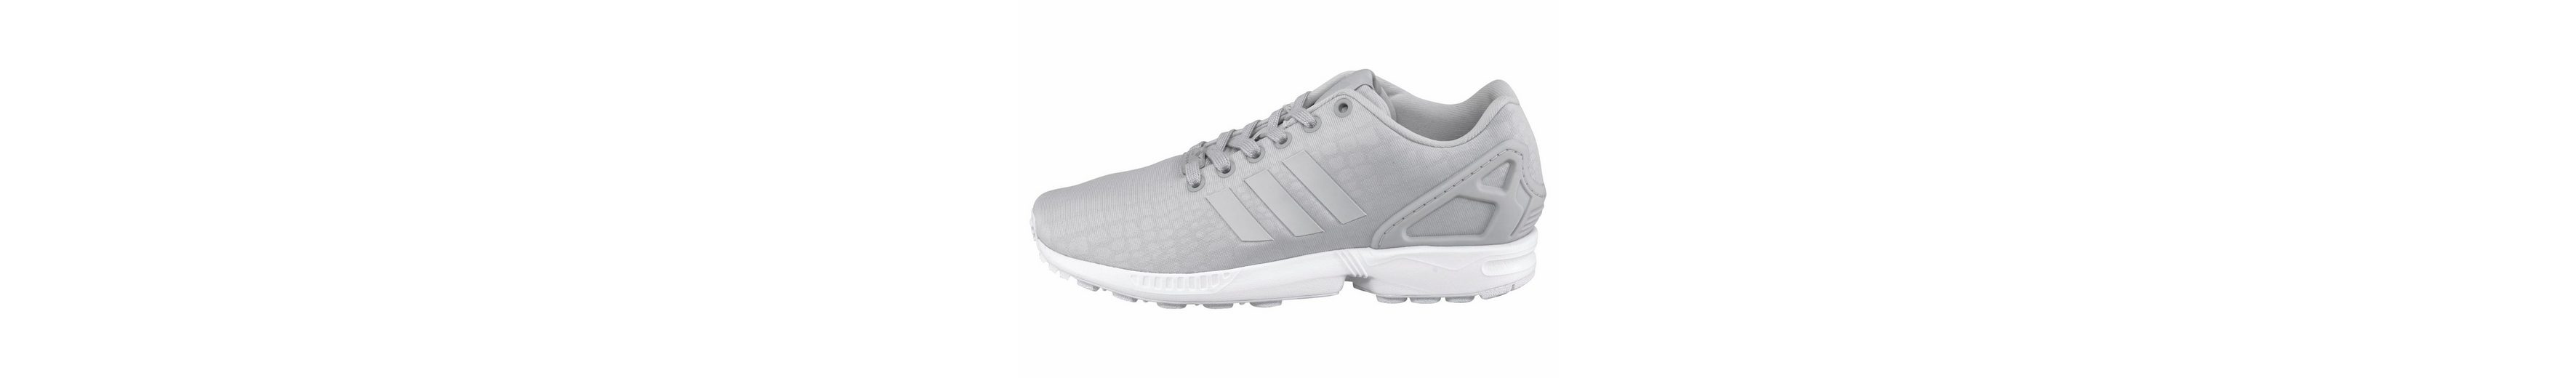 adidas Originals ZX Flux W Sneaker, Seasonal